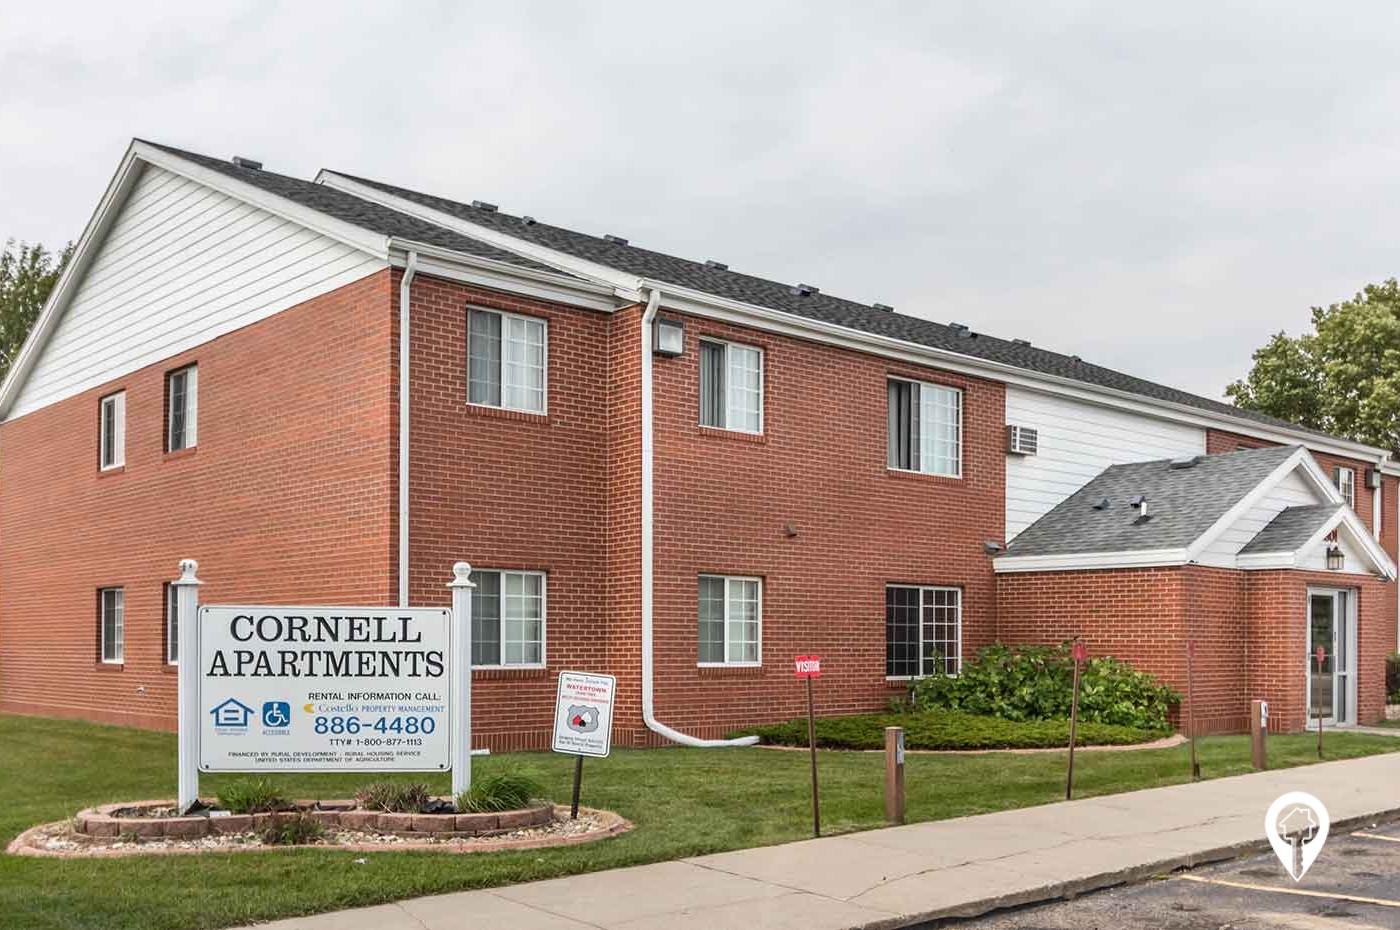 Cornell I Apartments